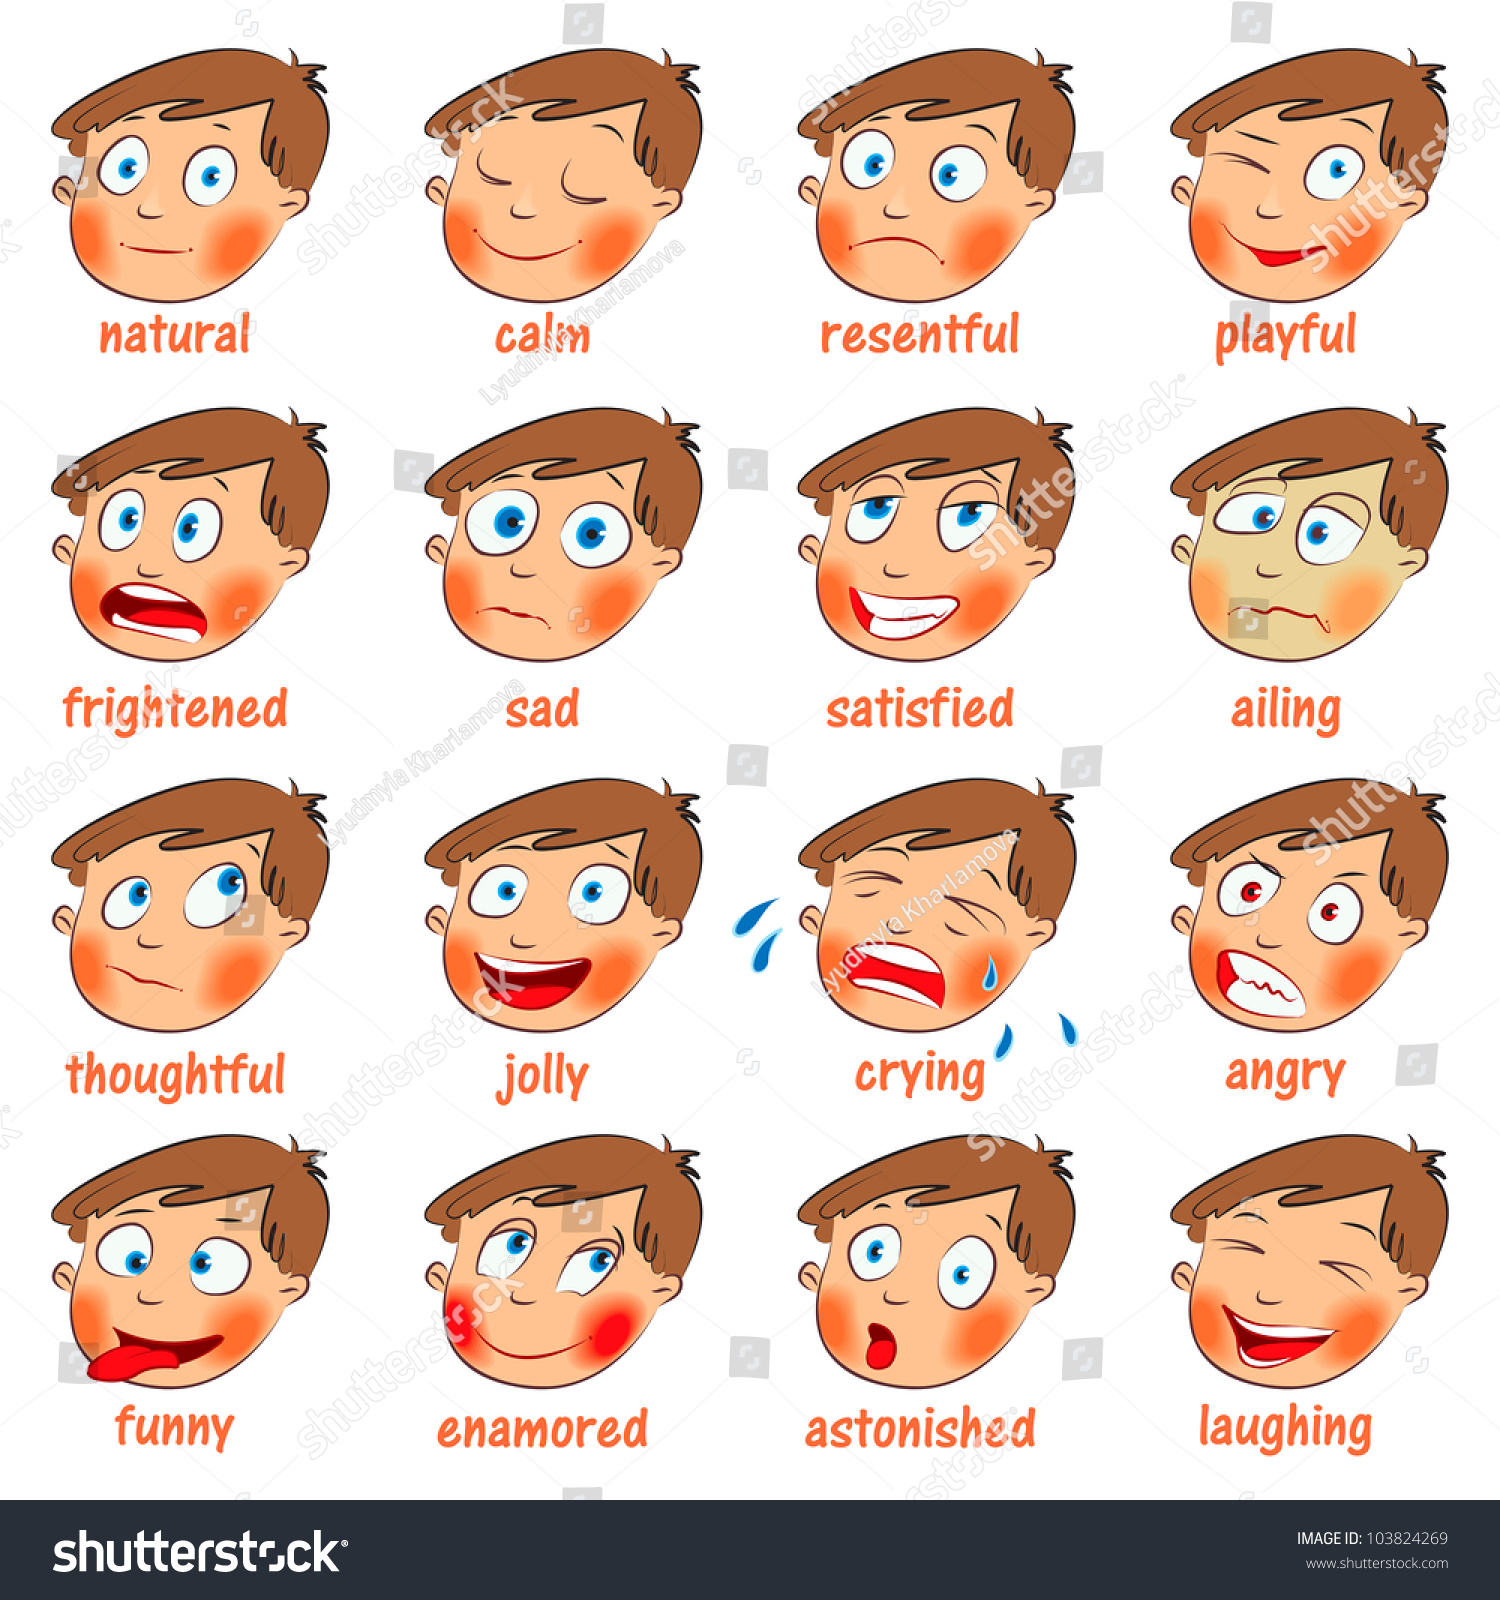 Emotions Cartoon Facial Expressions Set Natural Stock ...